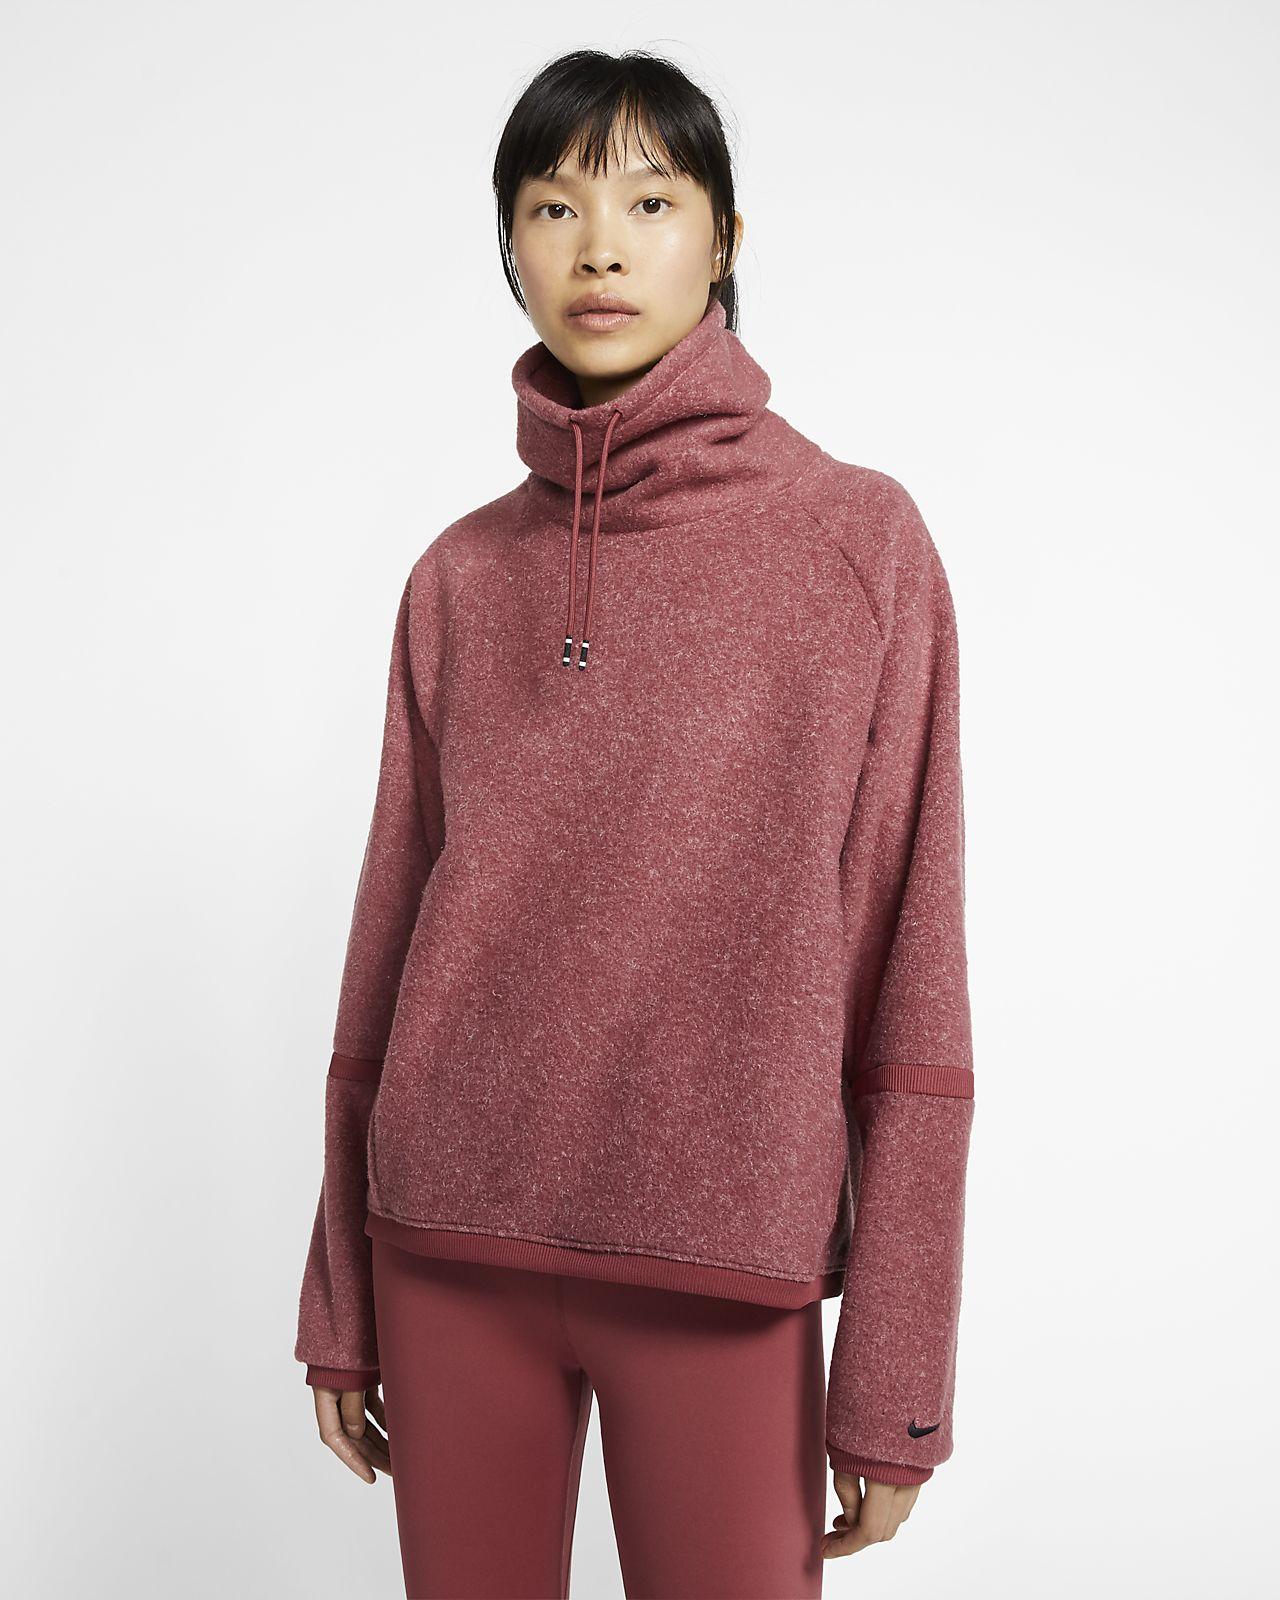 Nike Therma Langarm-Fleece-Trainingsoberteil für Damen